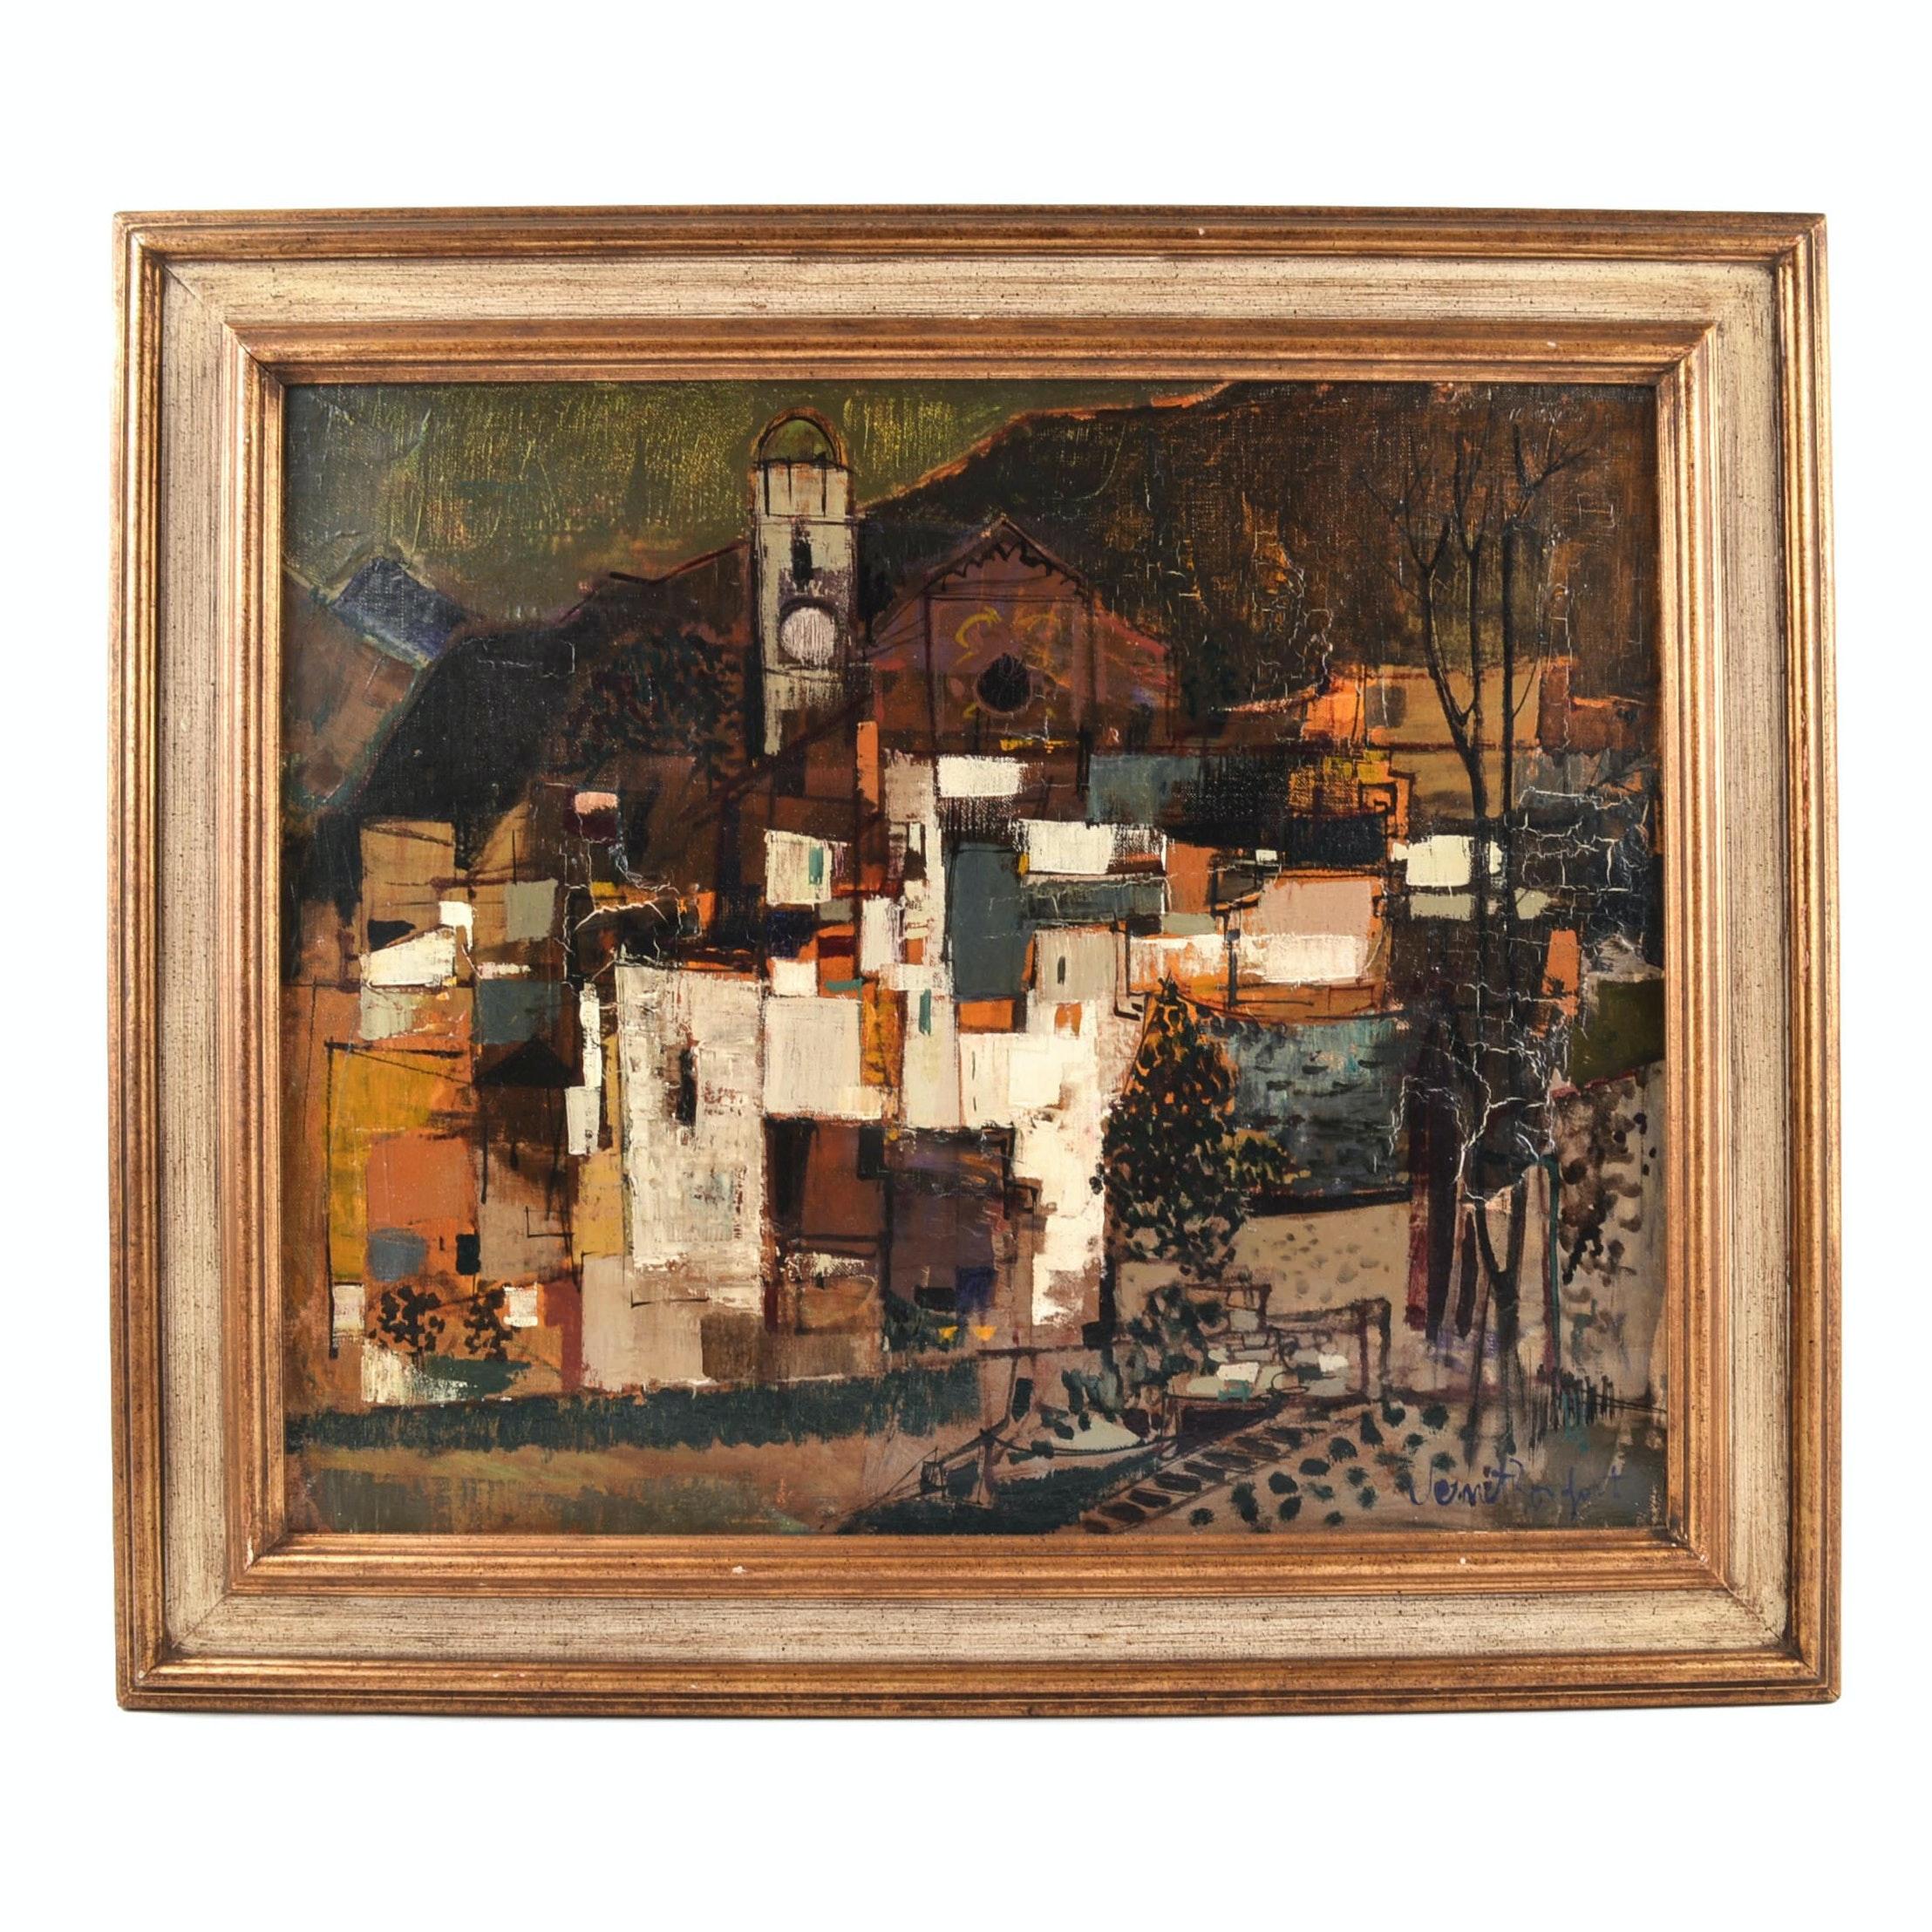 Robert Vernet-Bonfort Oil on Canvas Painting